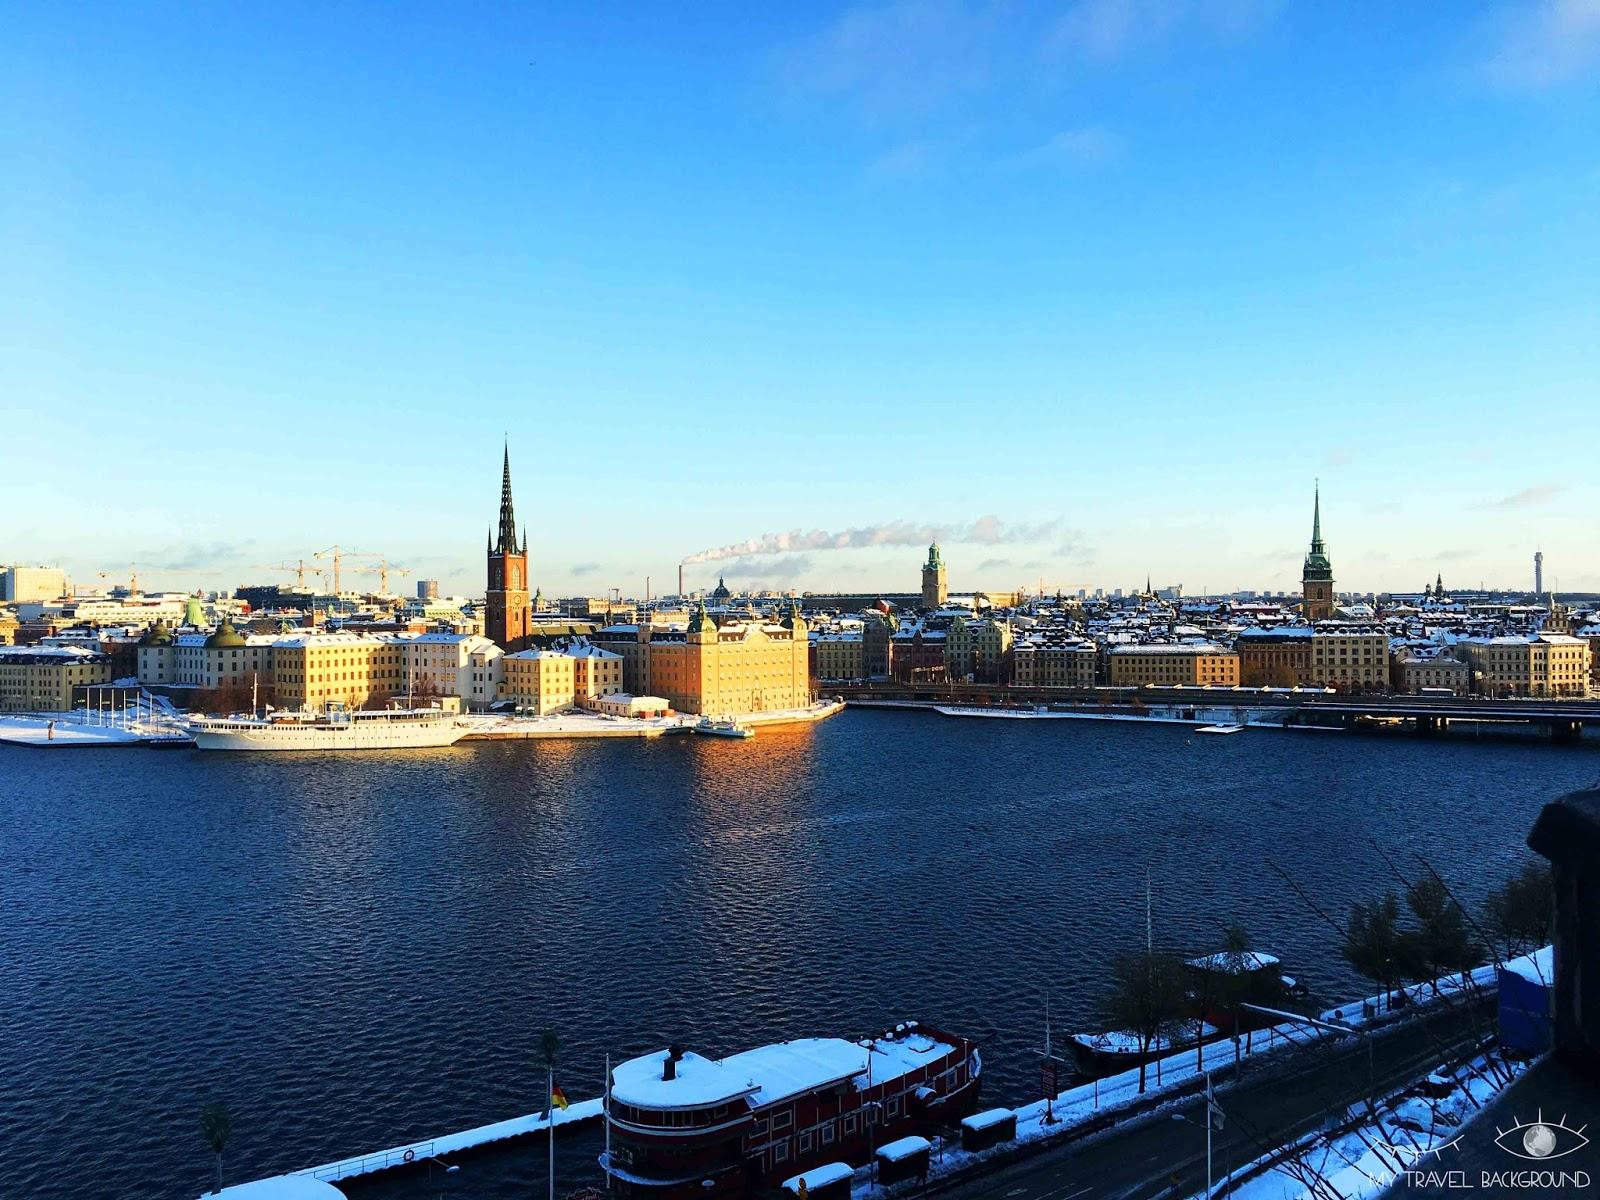 My Travel Background : Cartes Postales de Suède, Stockholm 2016